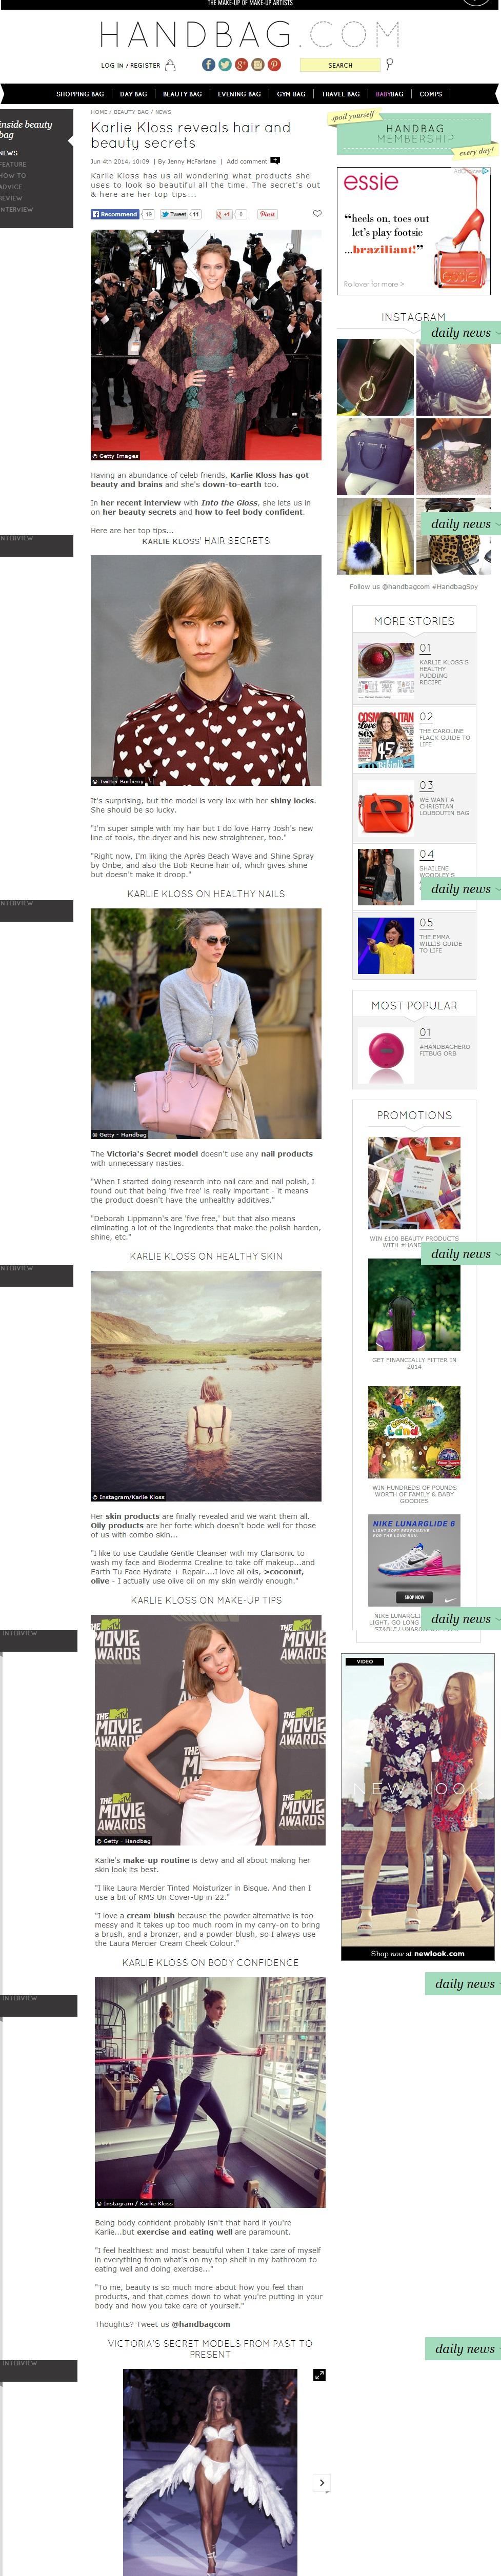 screencapture-www-handbag-com-beauty-bag-news-a575363-karlie-kloss-reveals-hair-and-beauty-secrets-html